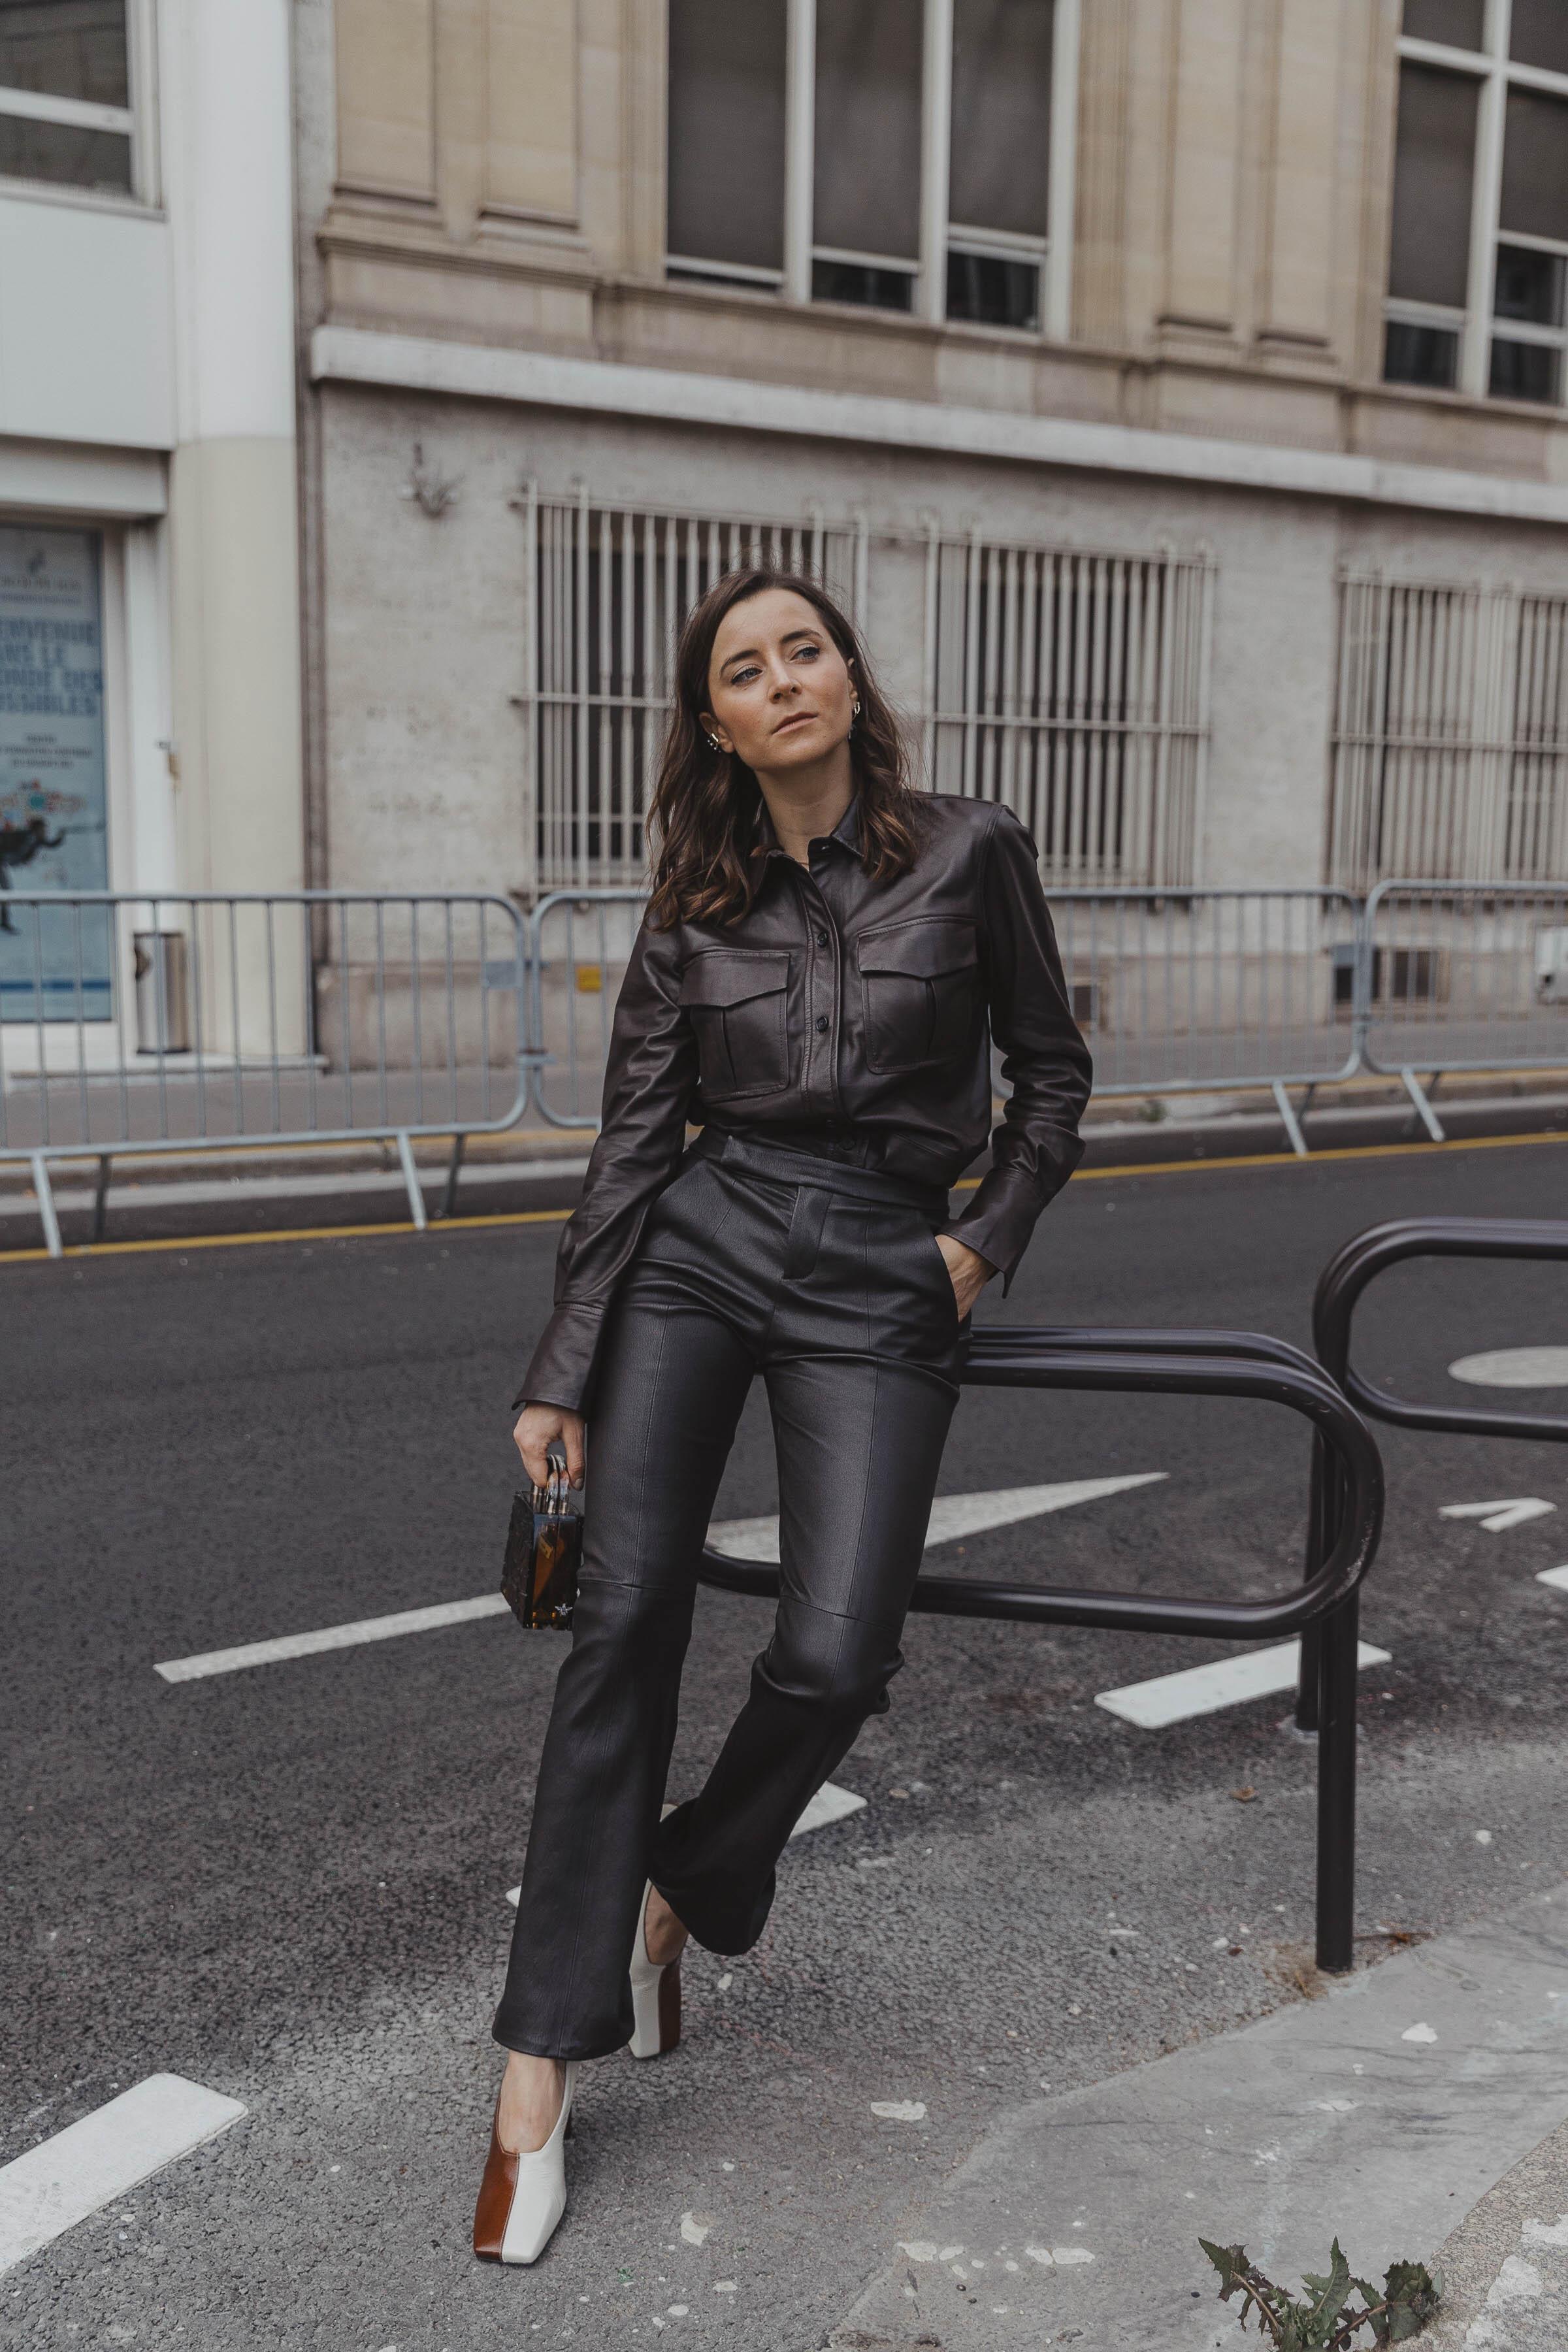 PFW SS20 Street Style Fall 2019 Paris Fashion Week Julia Comil wearing Equipment pants and shirt, bag Lilianafshar, pumps isa wandler